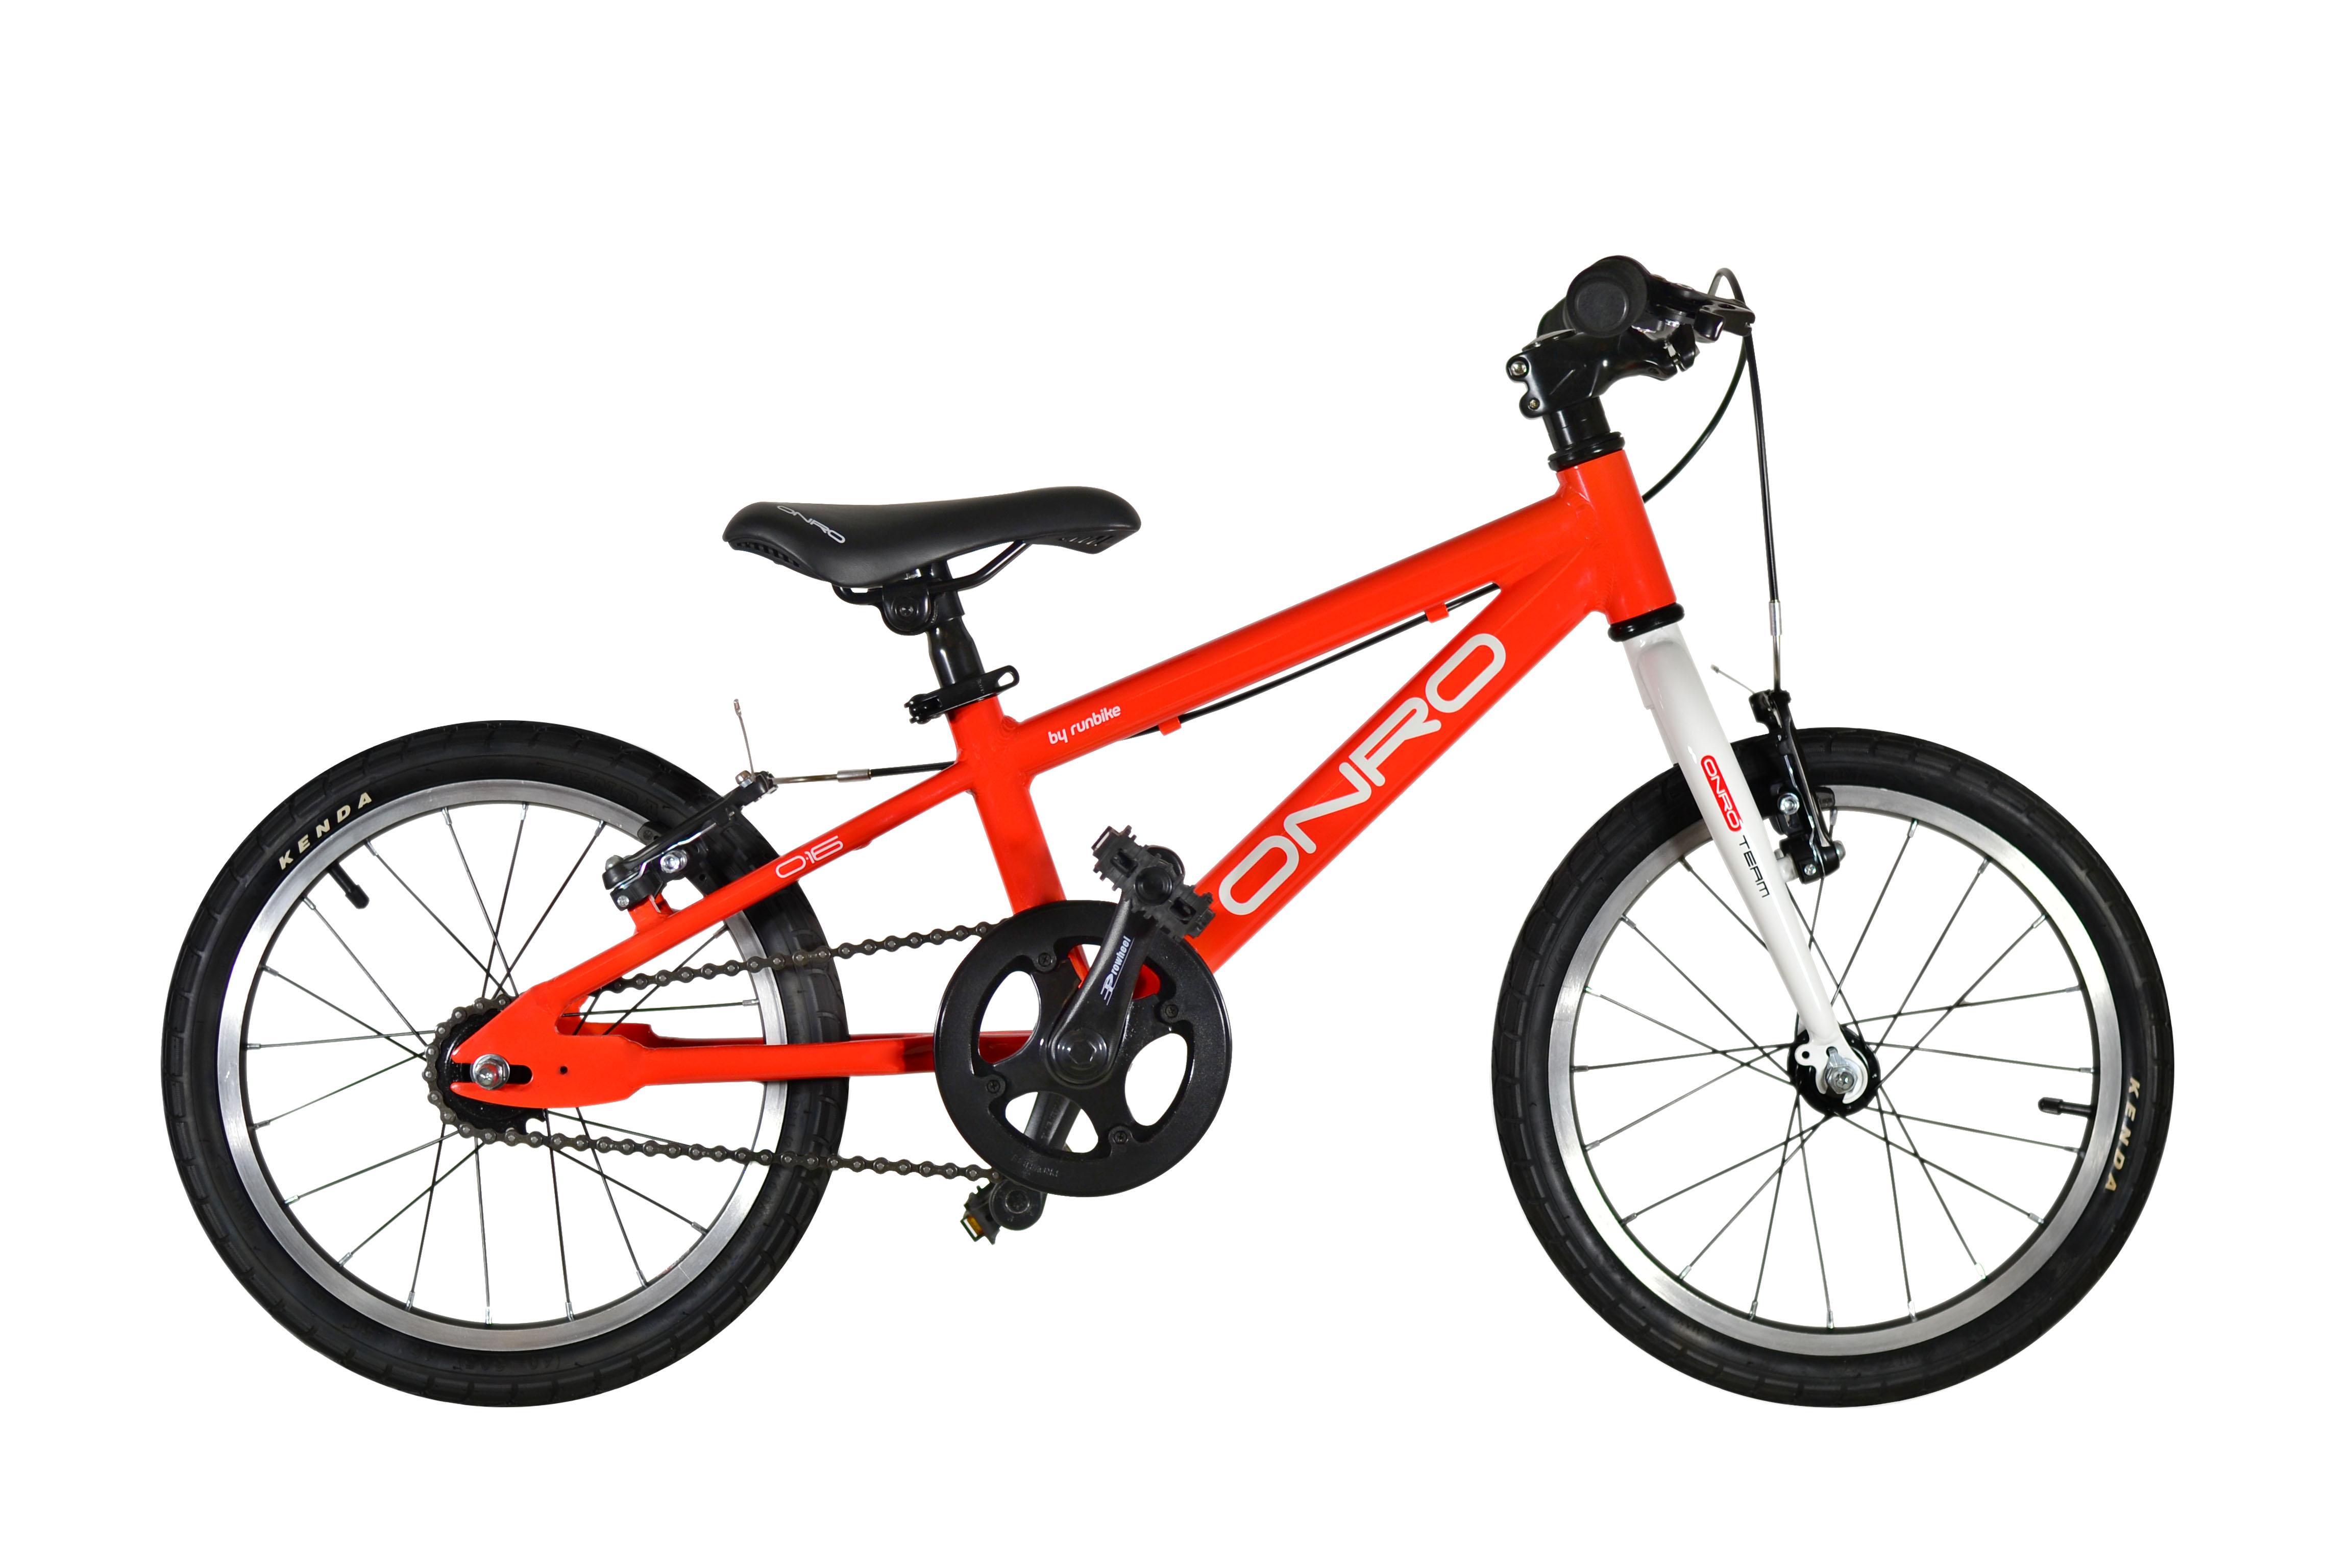 Onro Велосипед детский Onro by runbike диаметр колес 16 onro велосипед детский onro by runbike диаметр колес 16